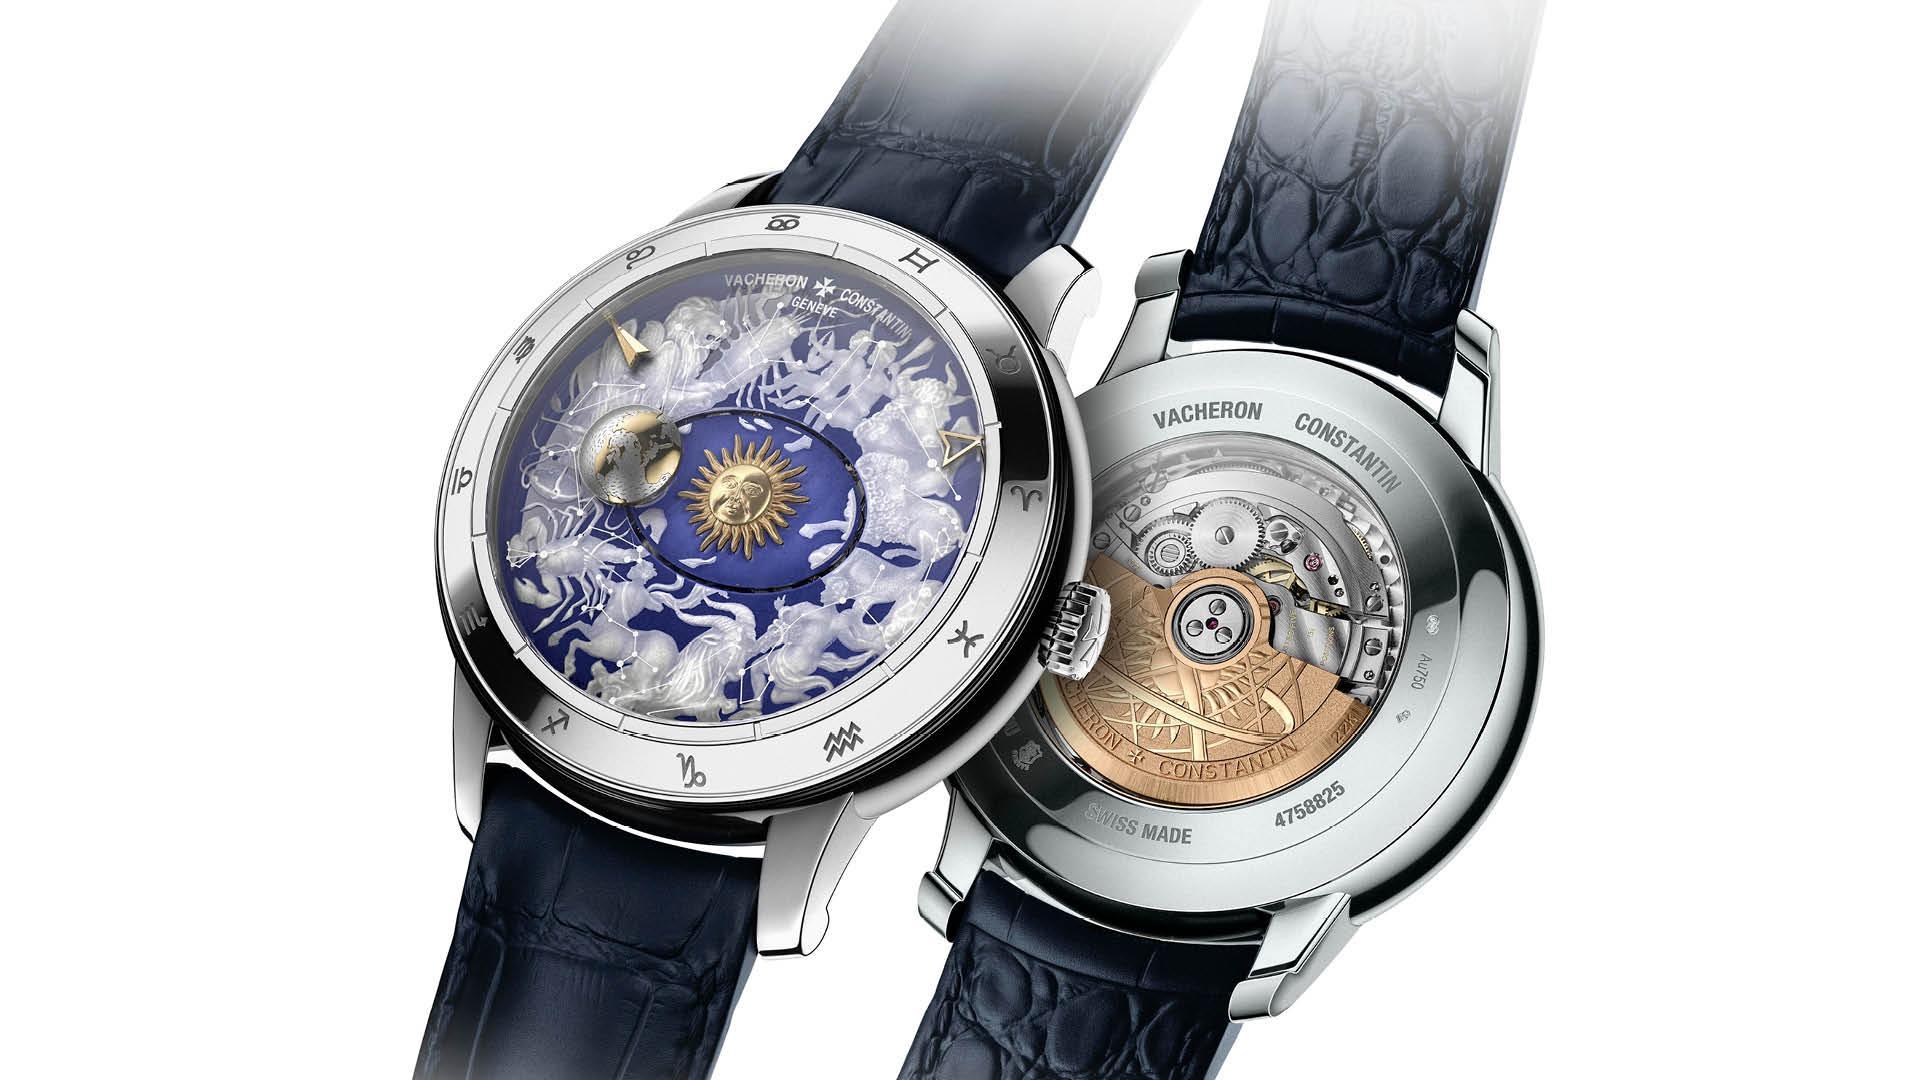 Vacheron Constantin Copernicus Sapphire